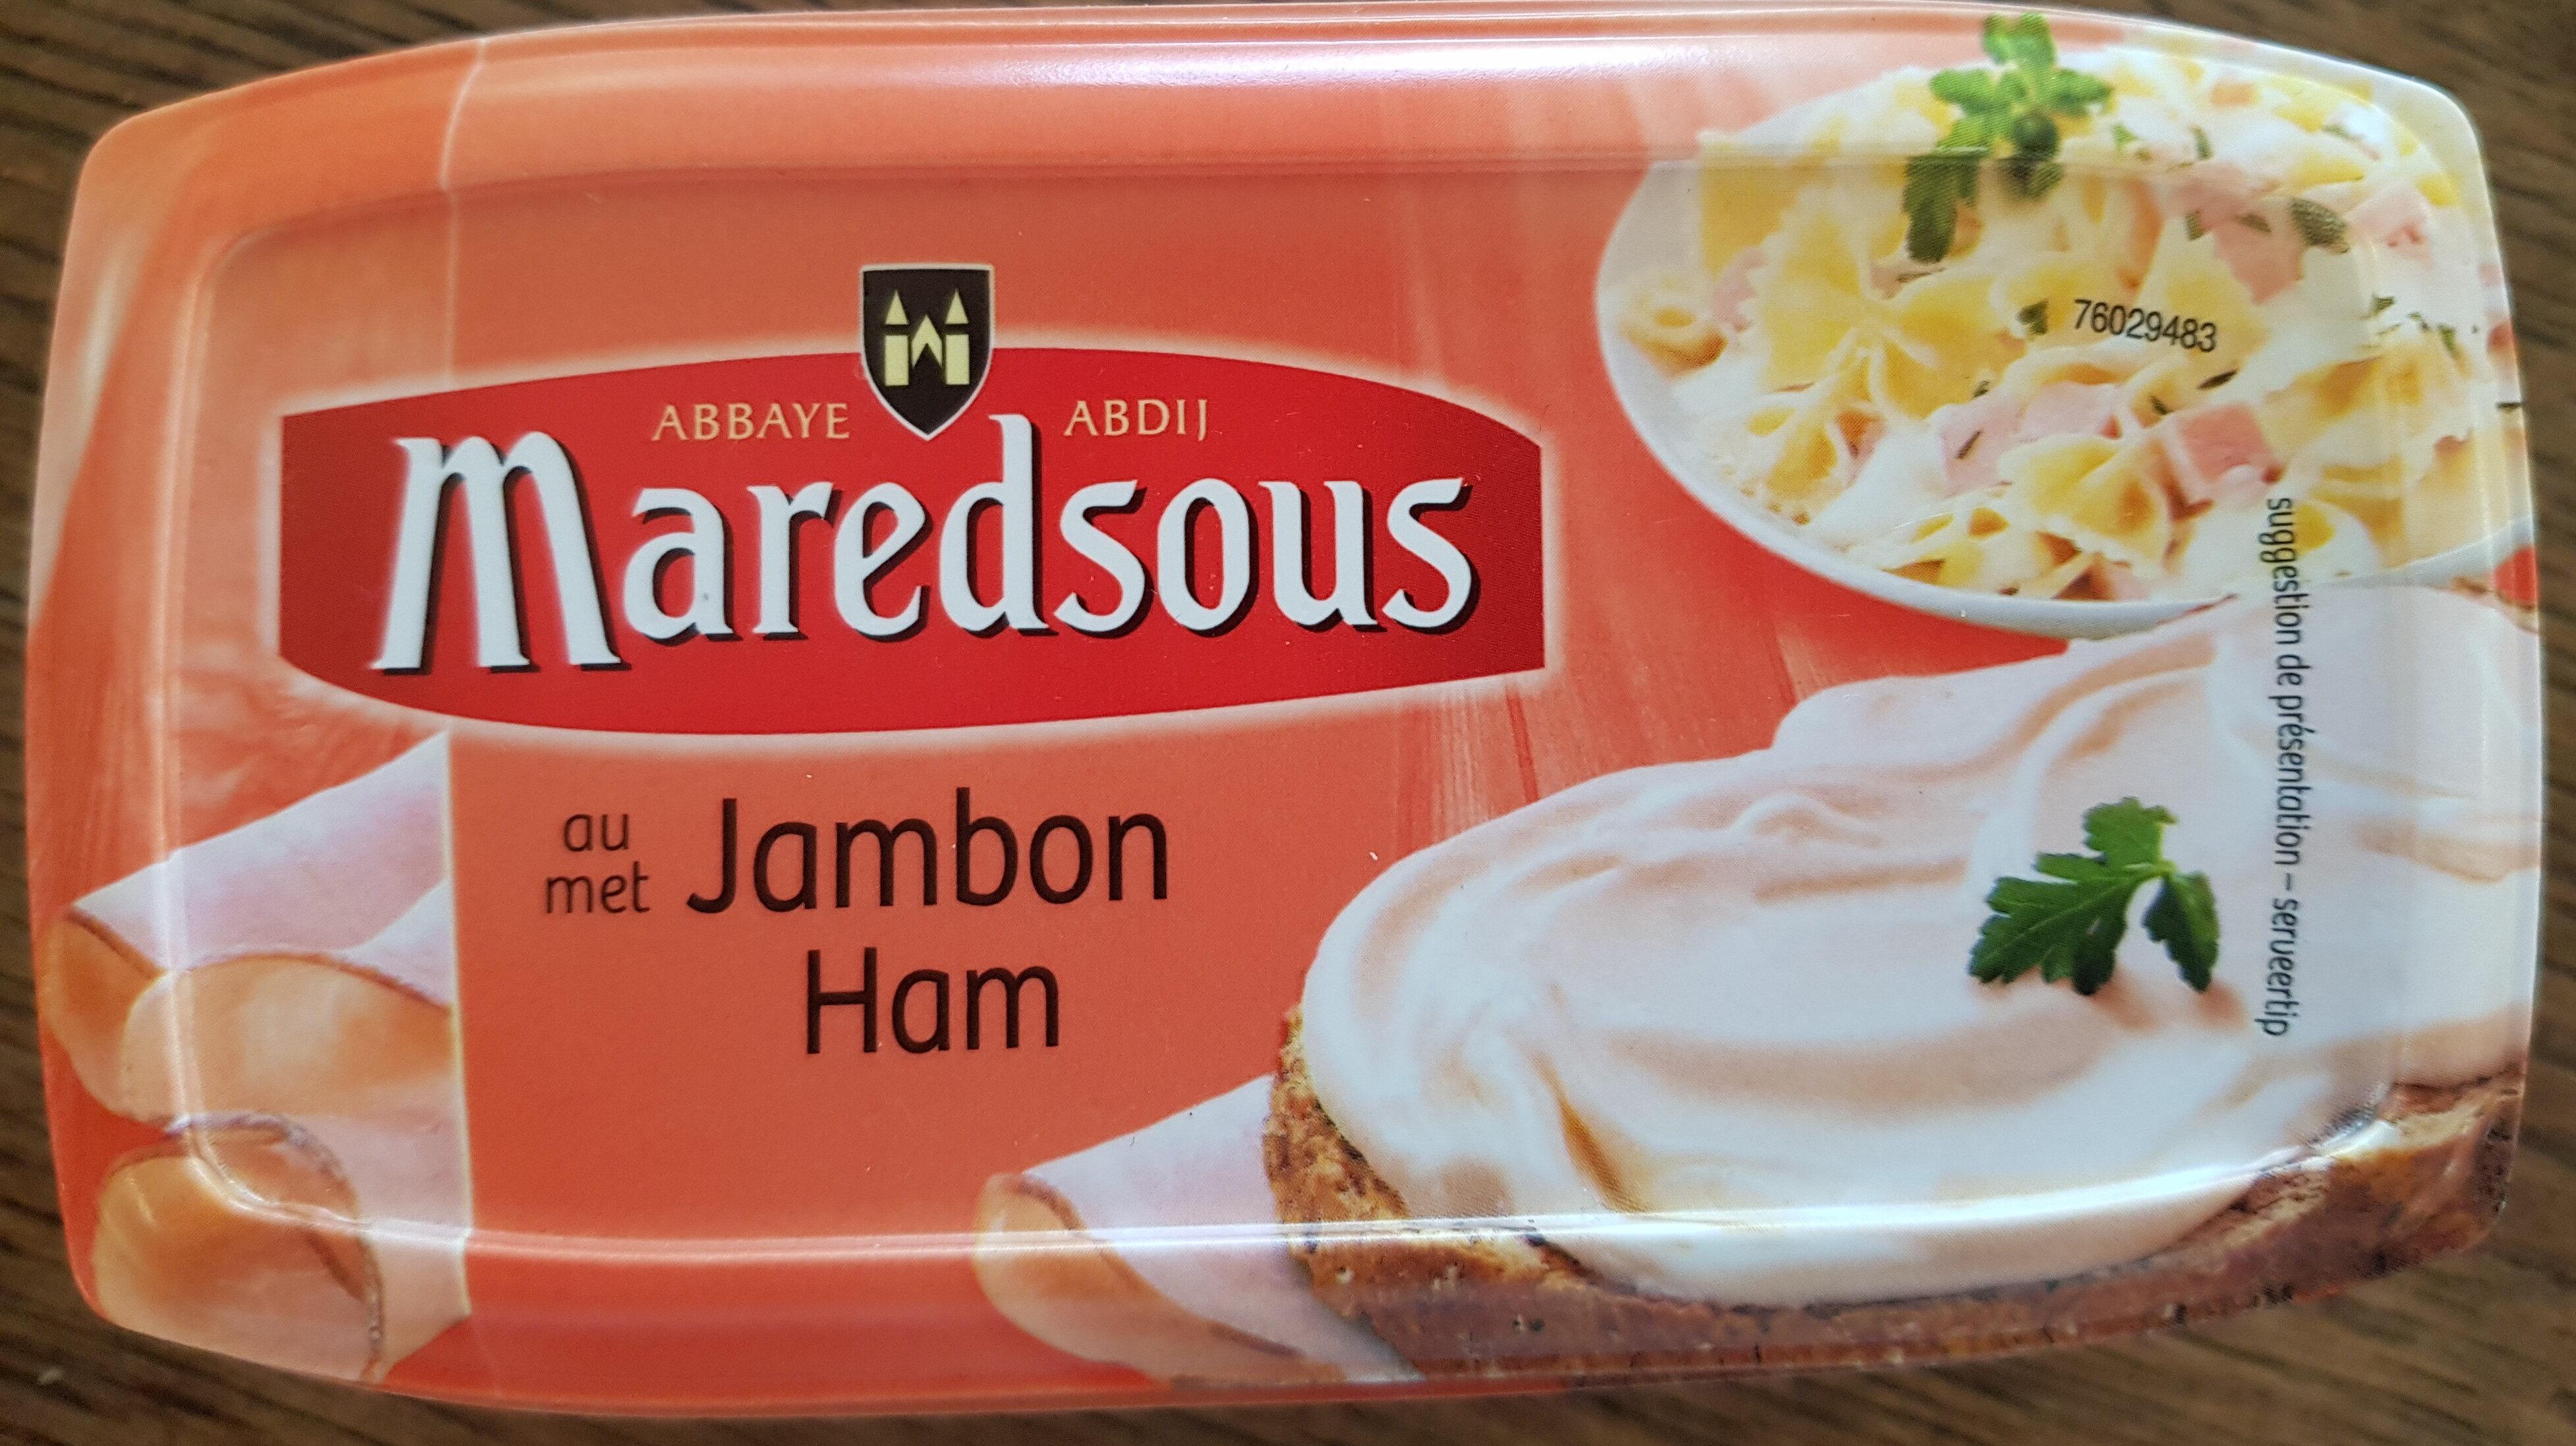 Fromage fondu au Jambon - Product - fr